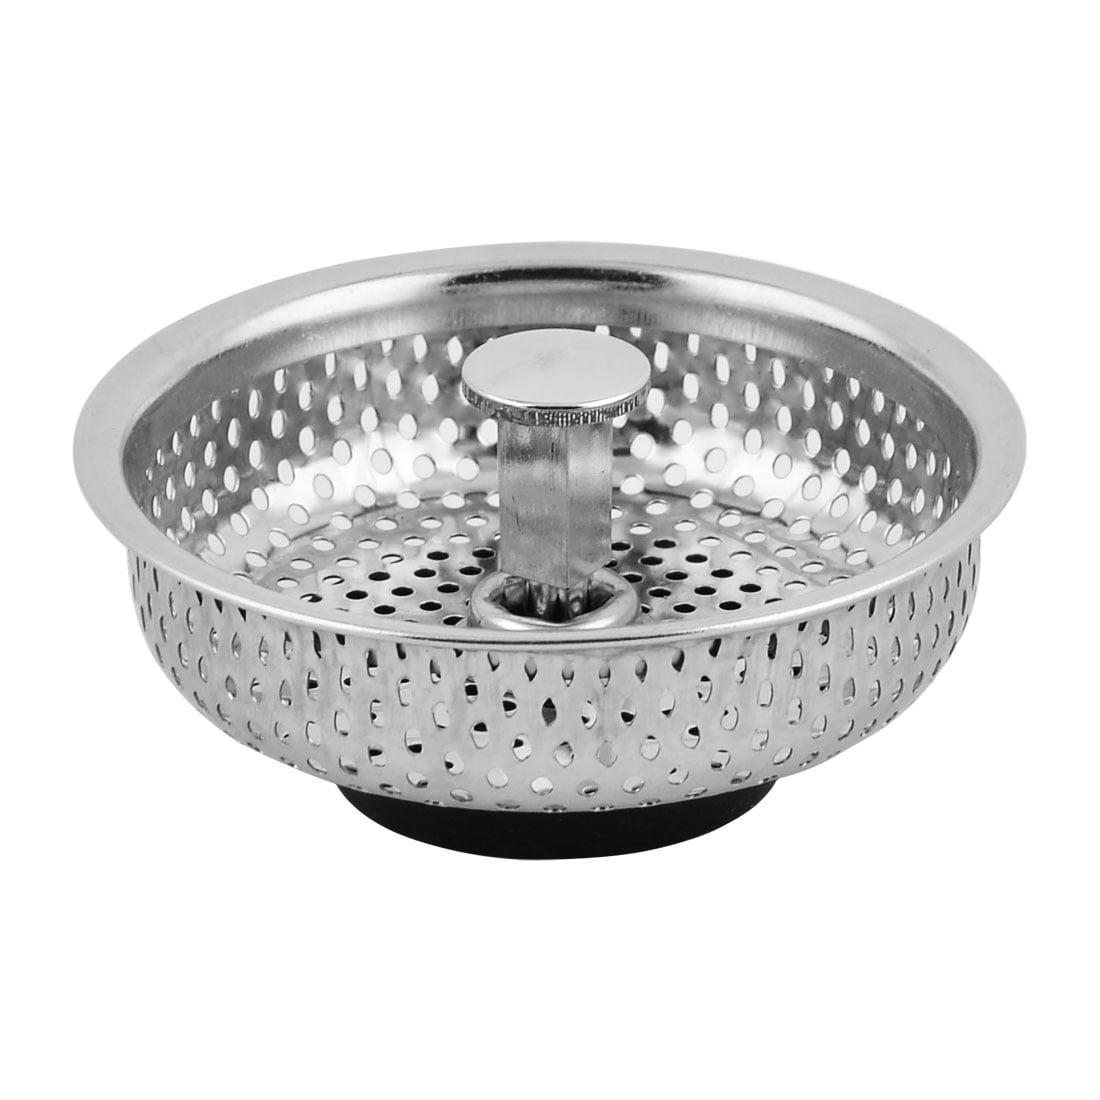 Washroom Kitchen Stainless Steel Sink Residue Scraps Filter Strainer Stopper by Unique-Bargains